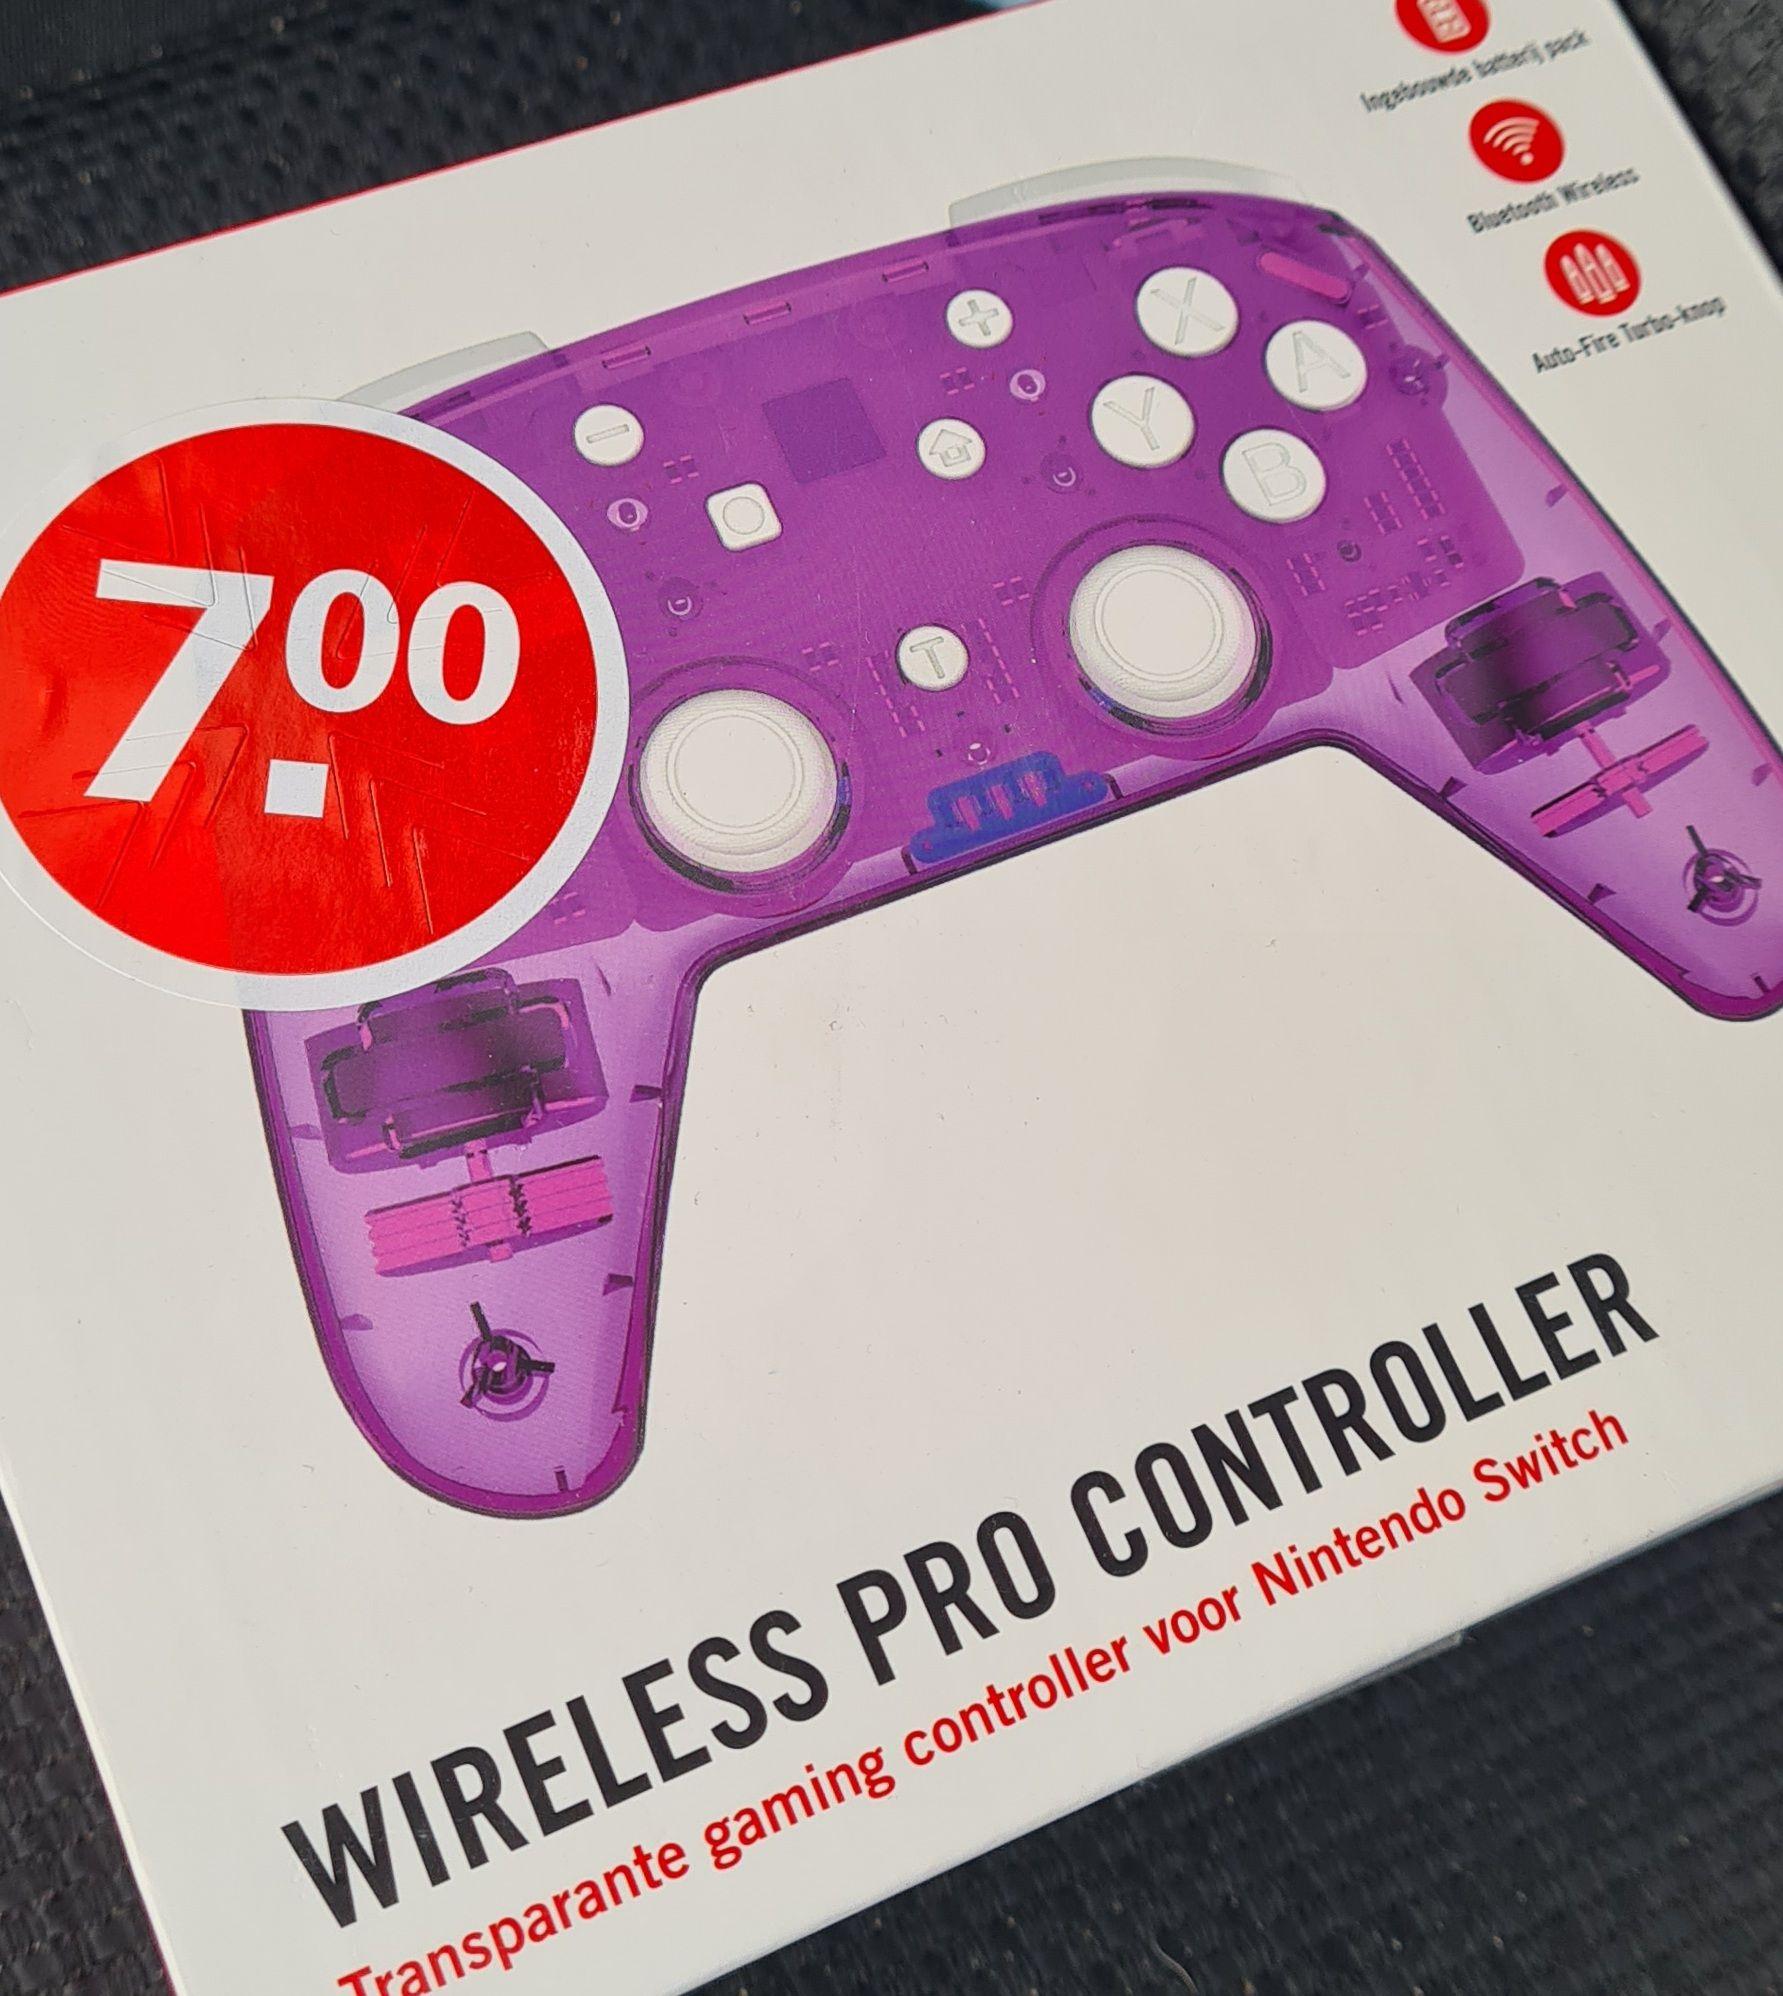 Wireless Pro controller nintendo switch